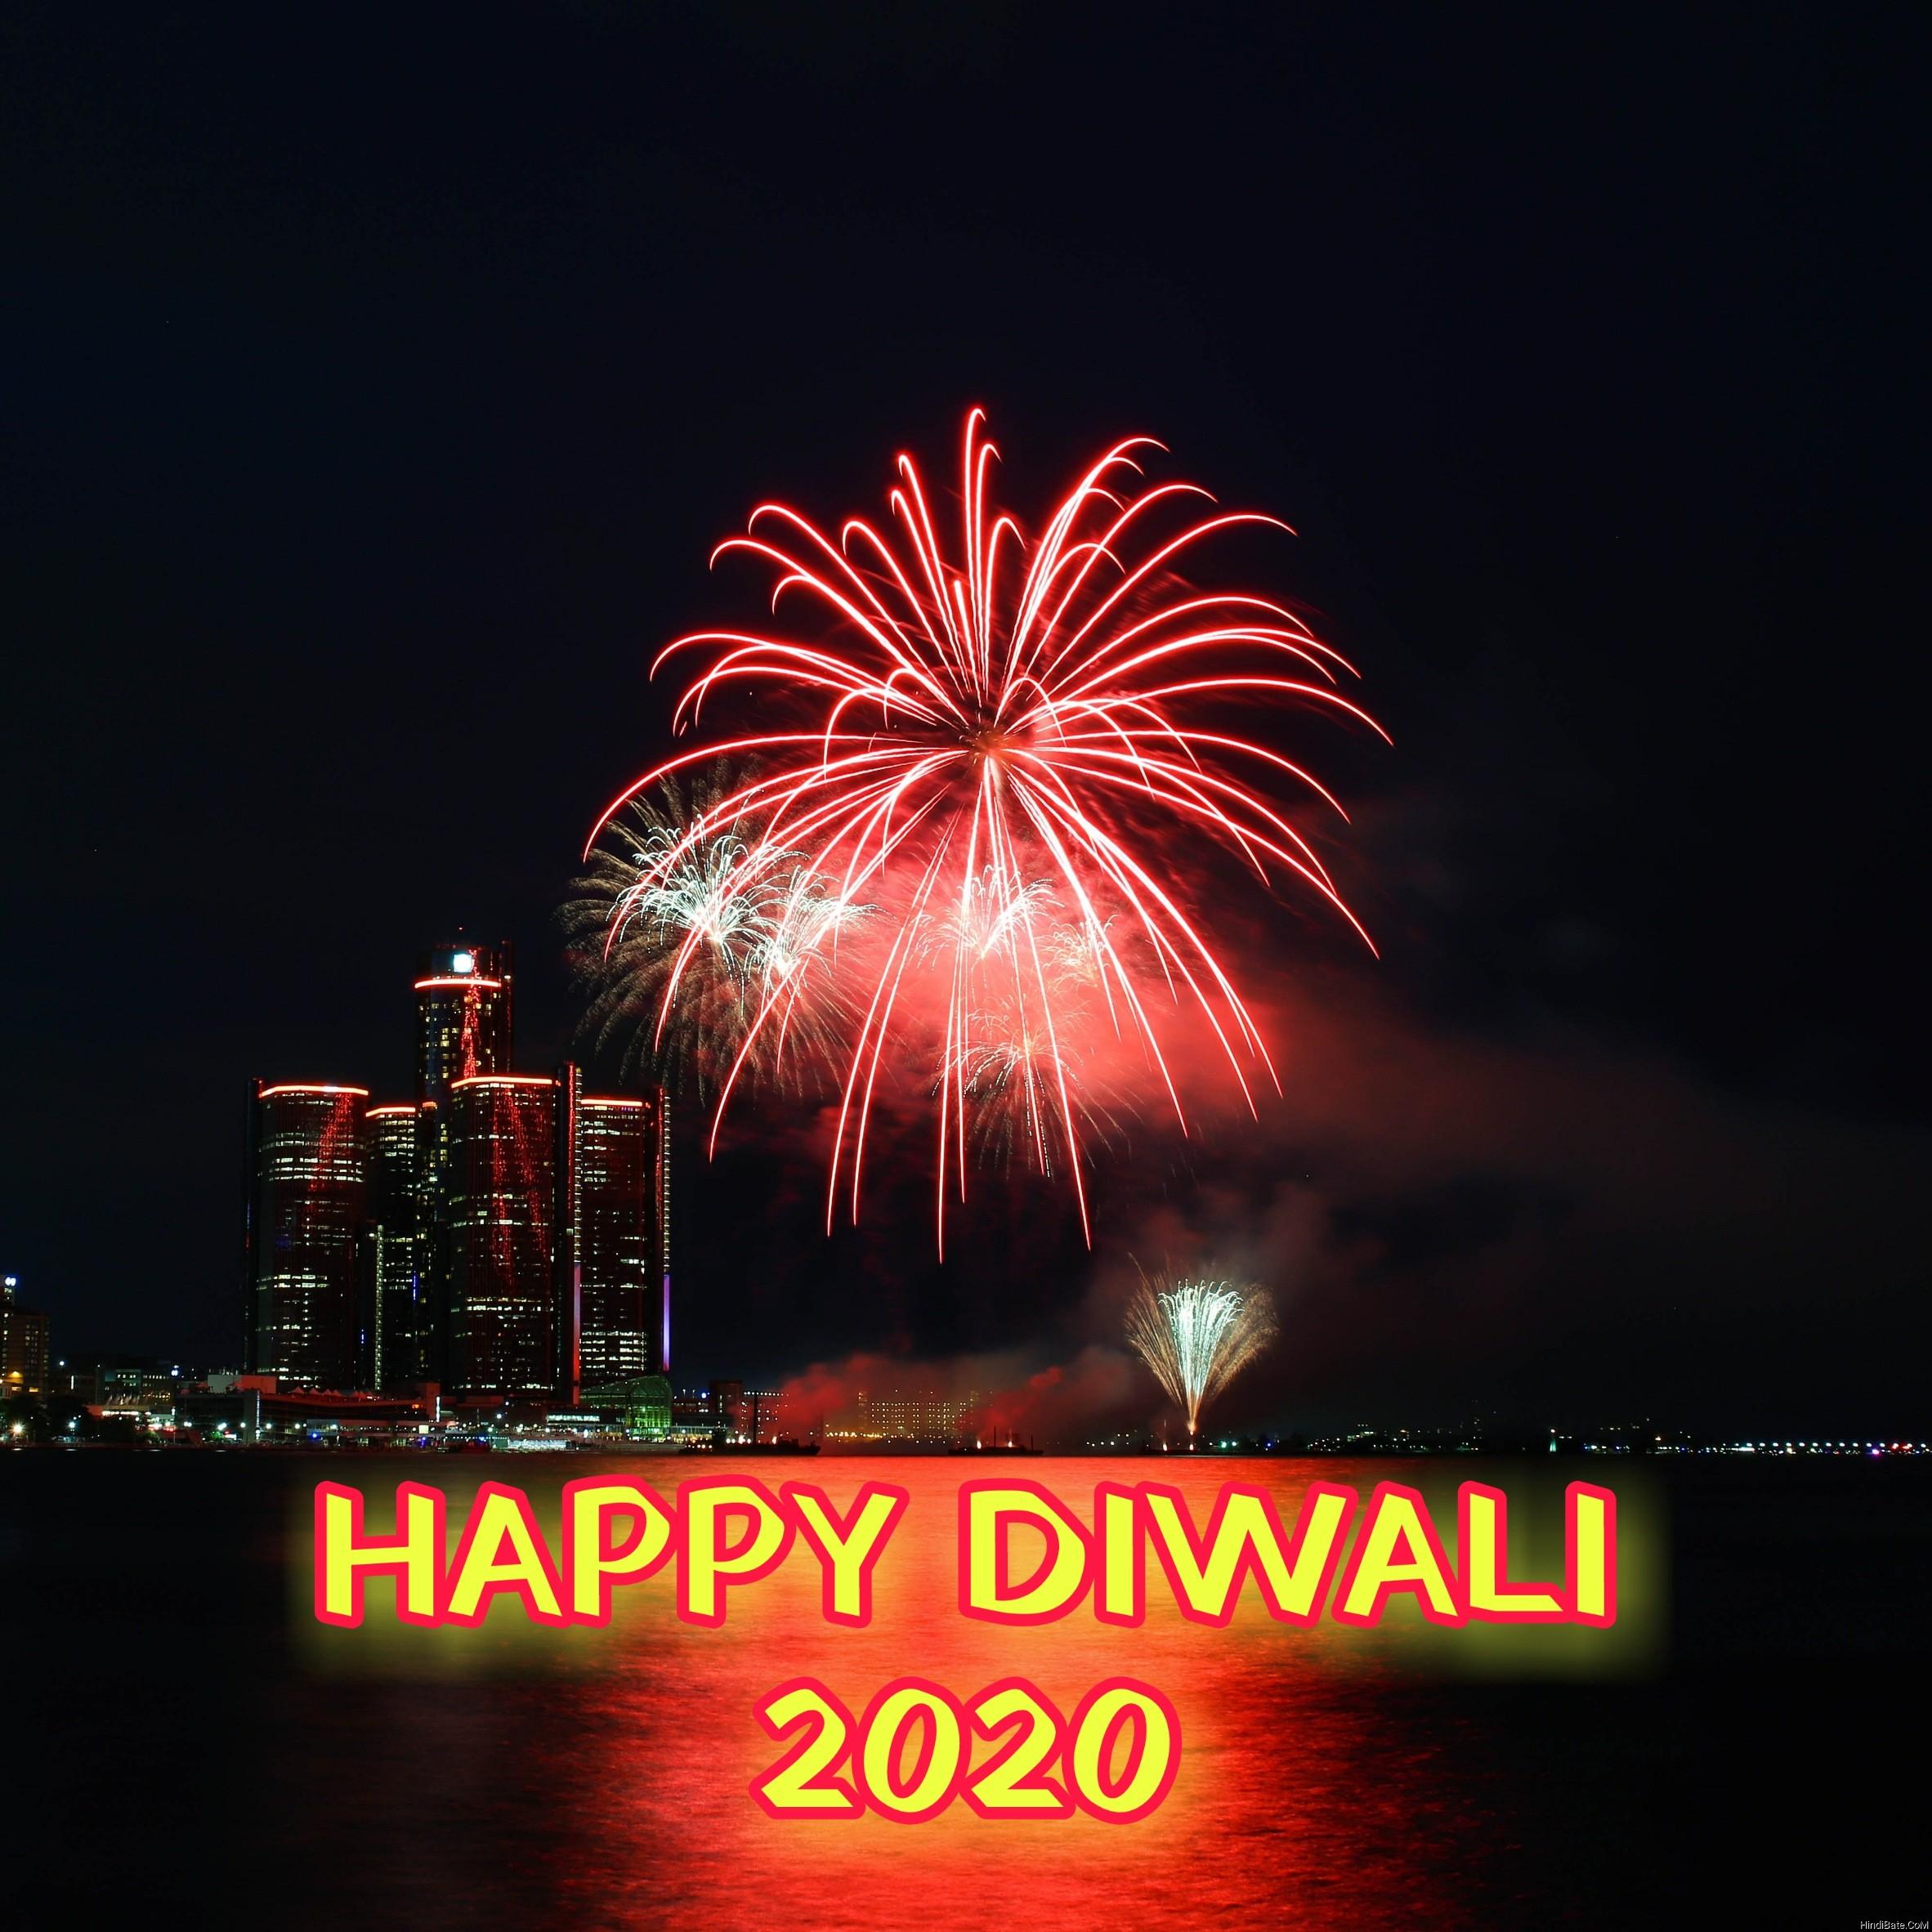 Happy Diwali 2020 images download